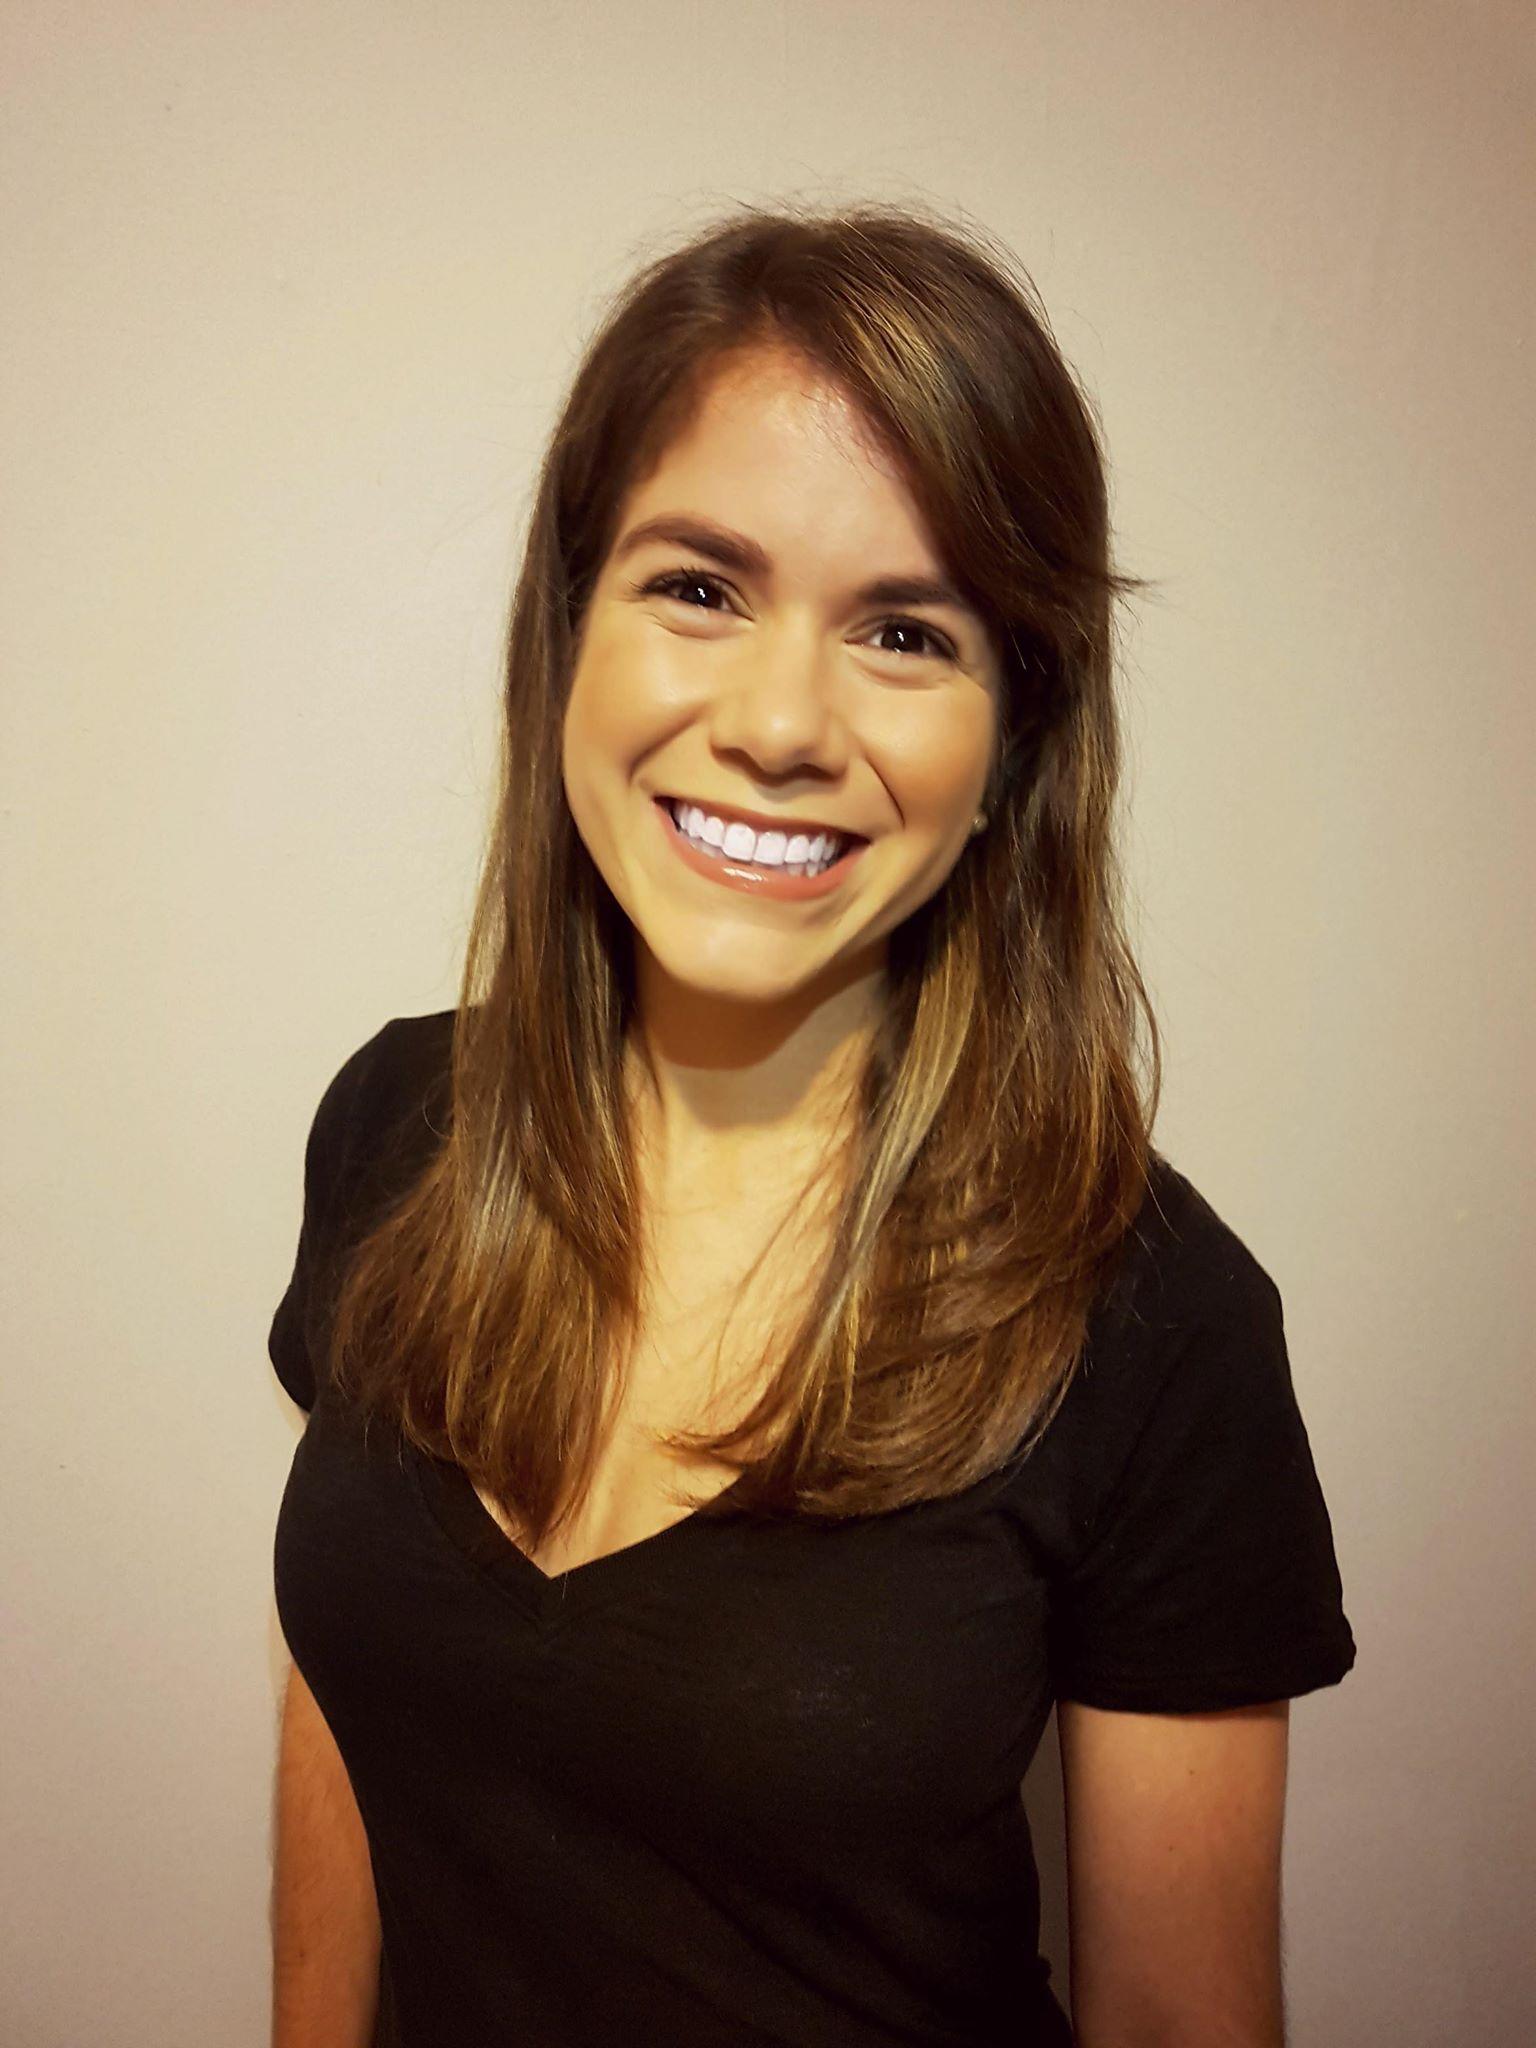 Interview: Marine Biologist Melissa Cristina Márquez